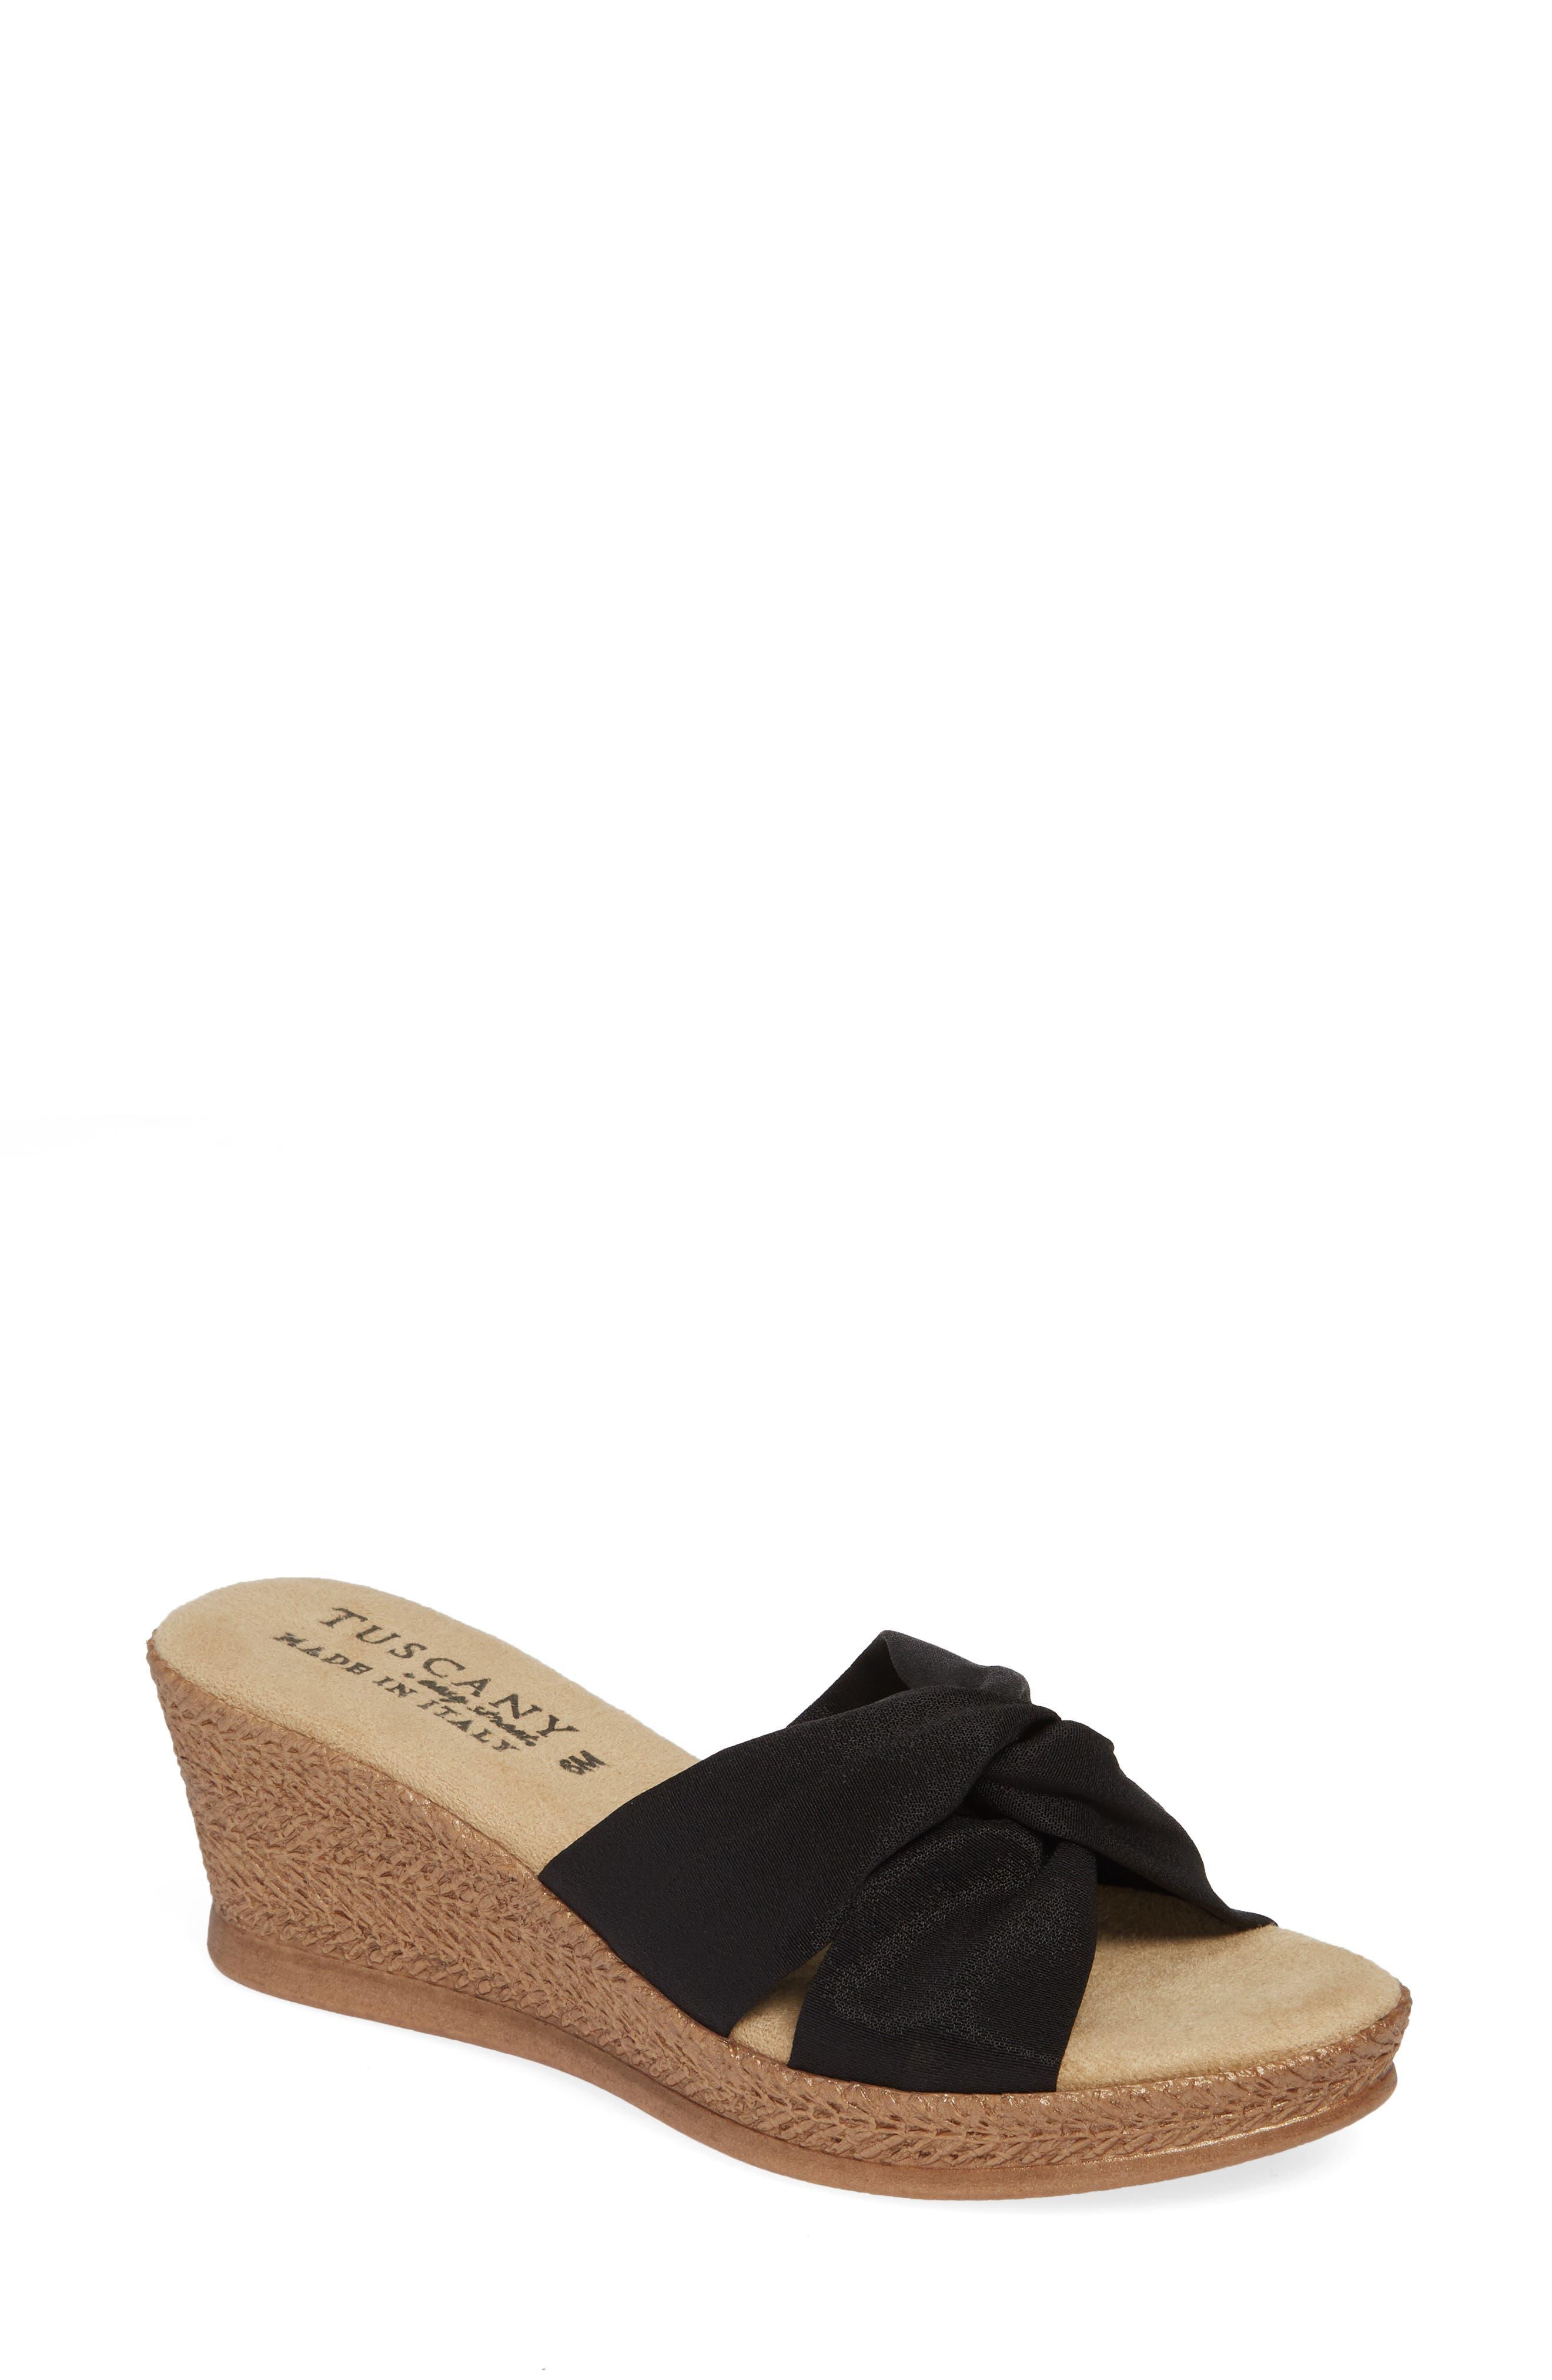 TUSCANY BY EASY STREET<SUP>®</SUP>, Dinah Platform Wedge Sandal, Main thumbnail 1, color, BLACK FABRIC